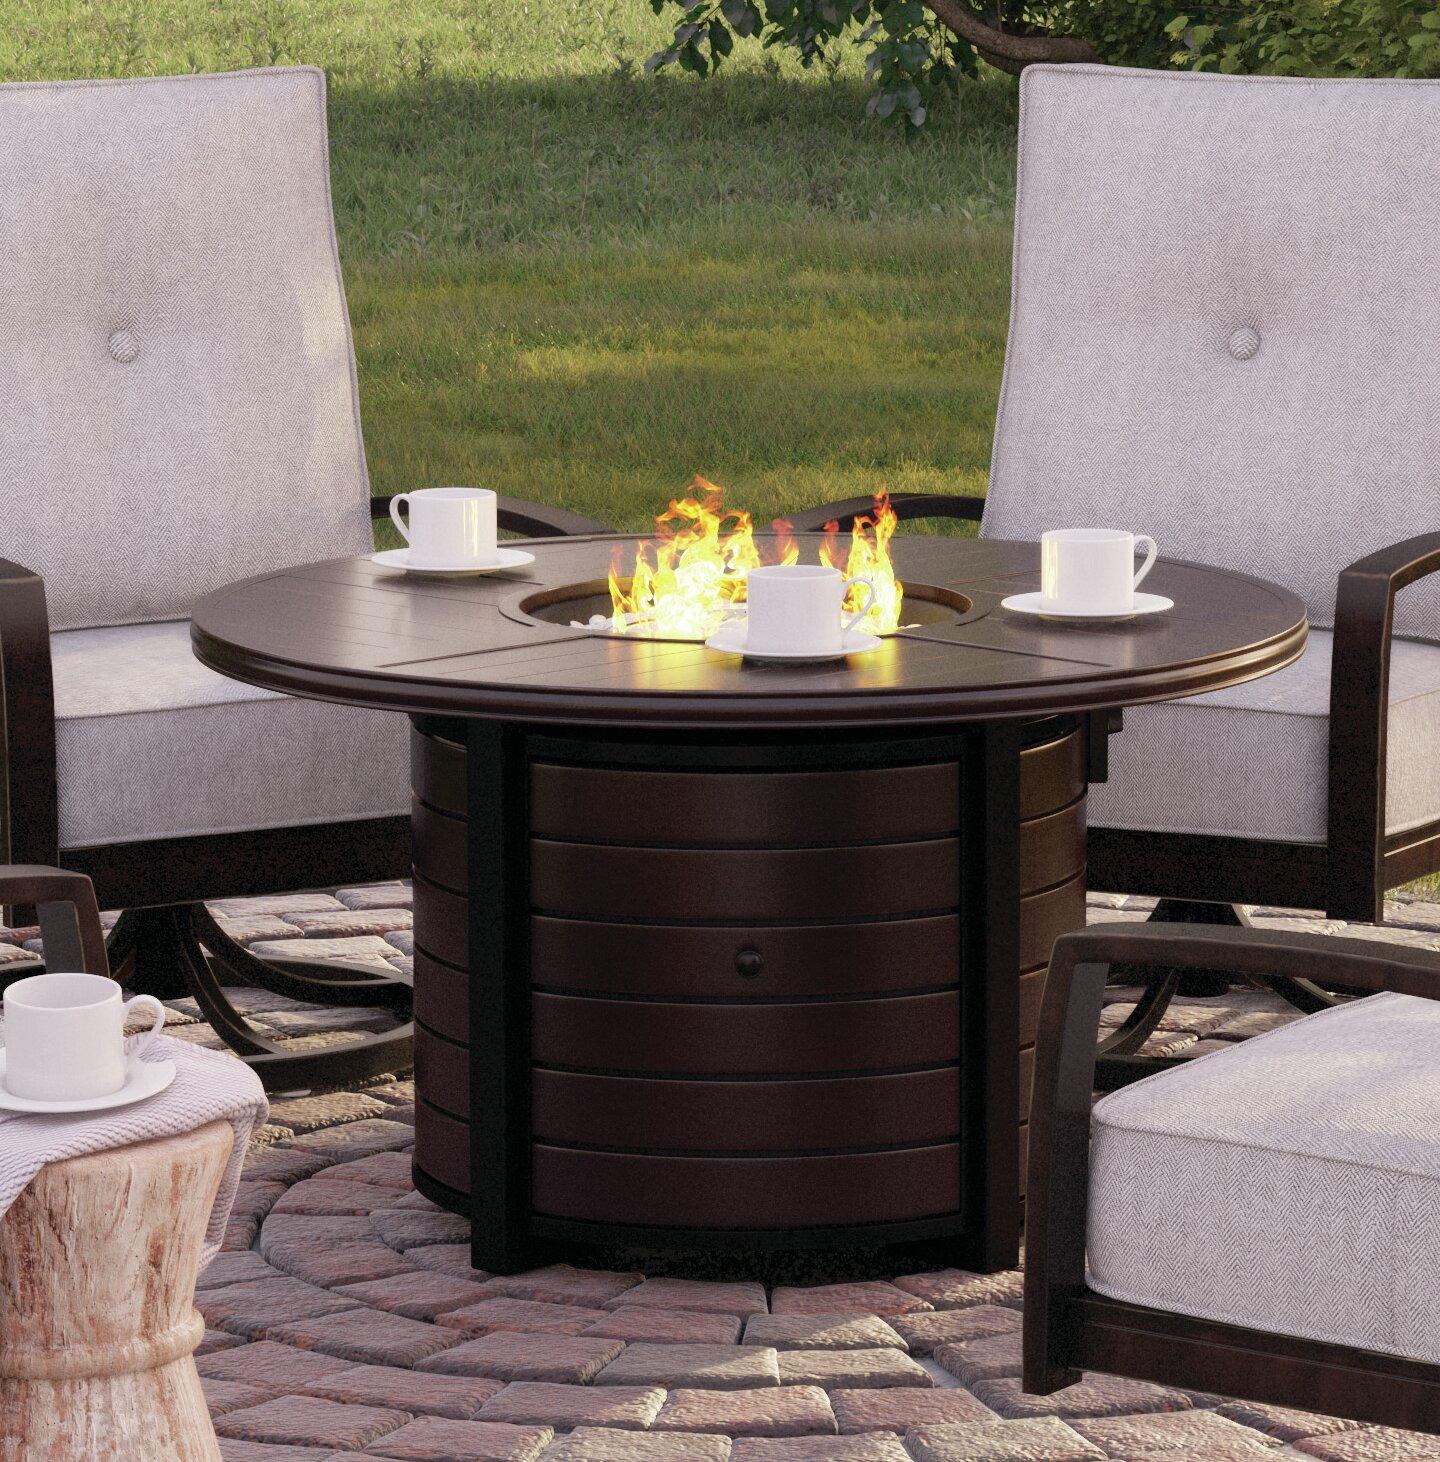 Outdoor Propane Fire Pit.Schum Aluminum Propane Fire Pit Table